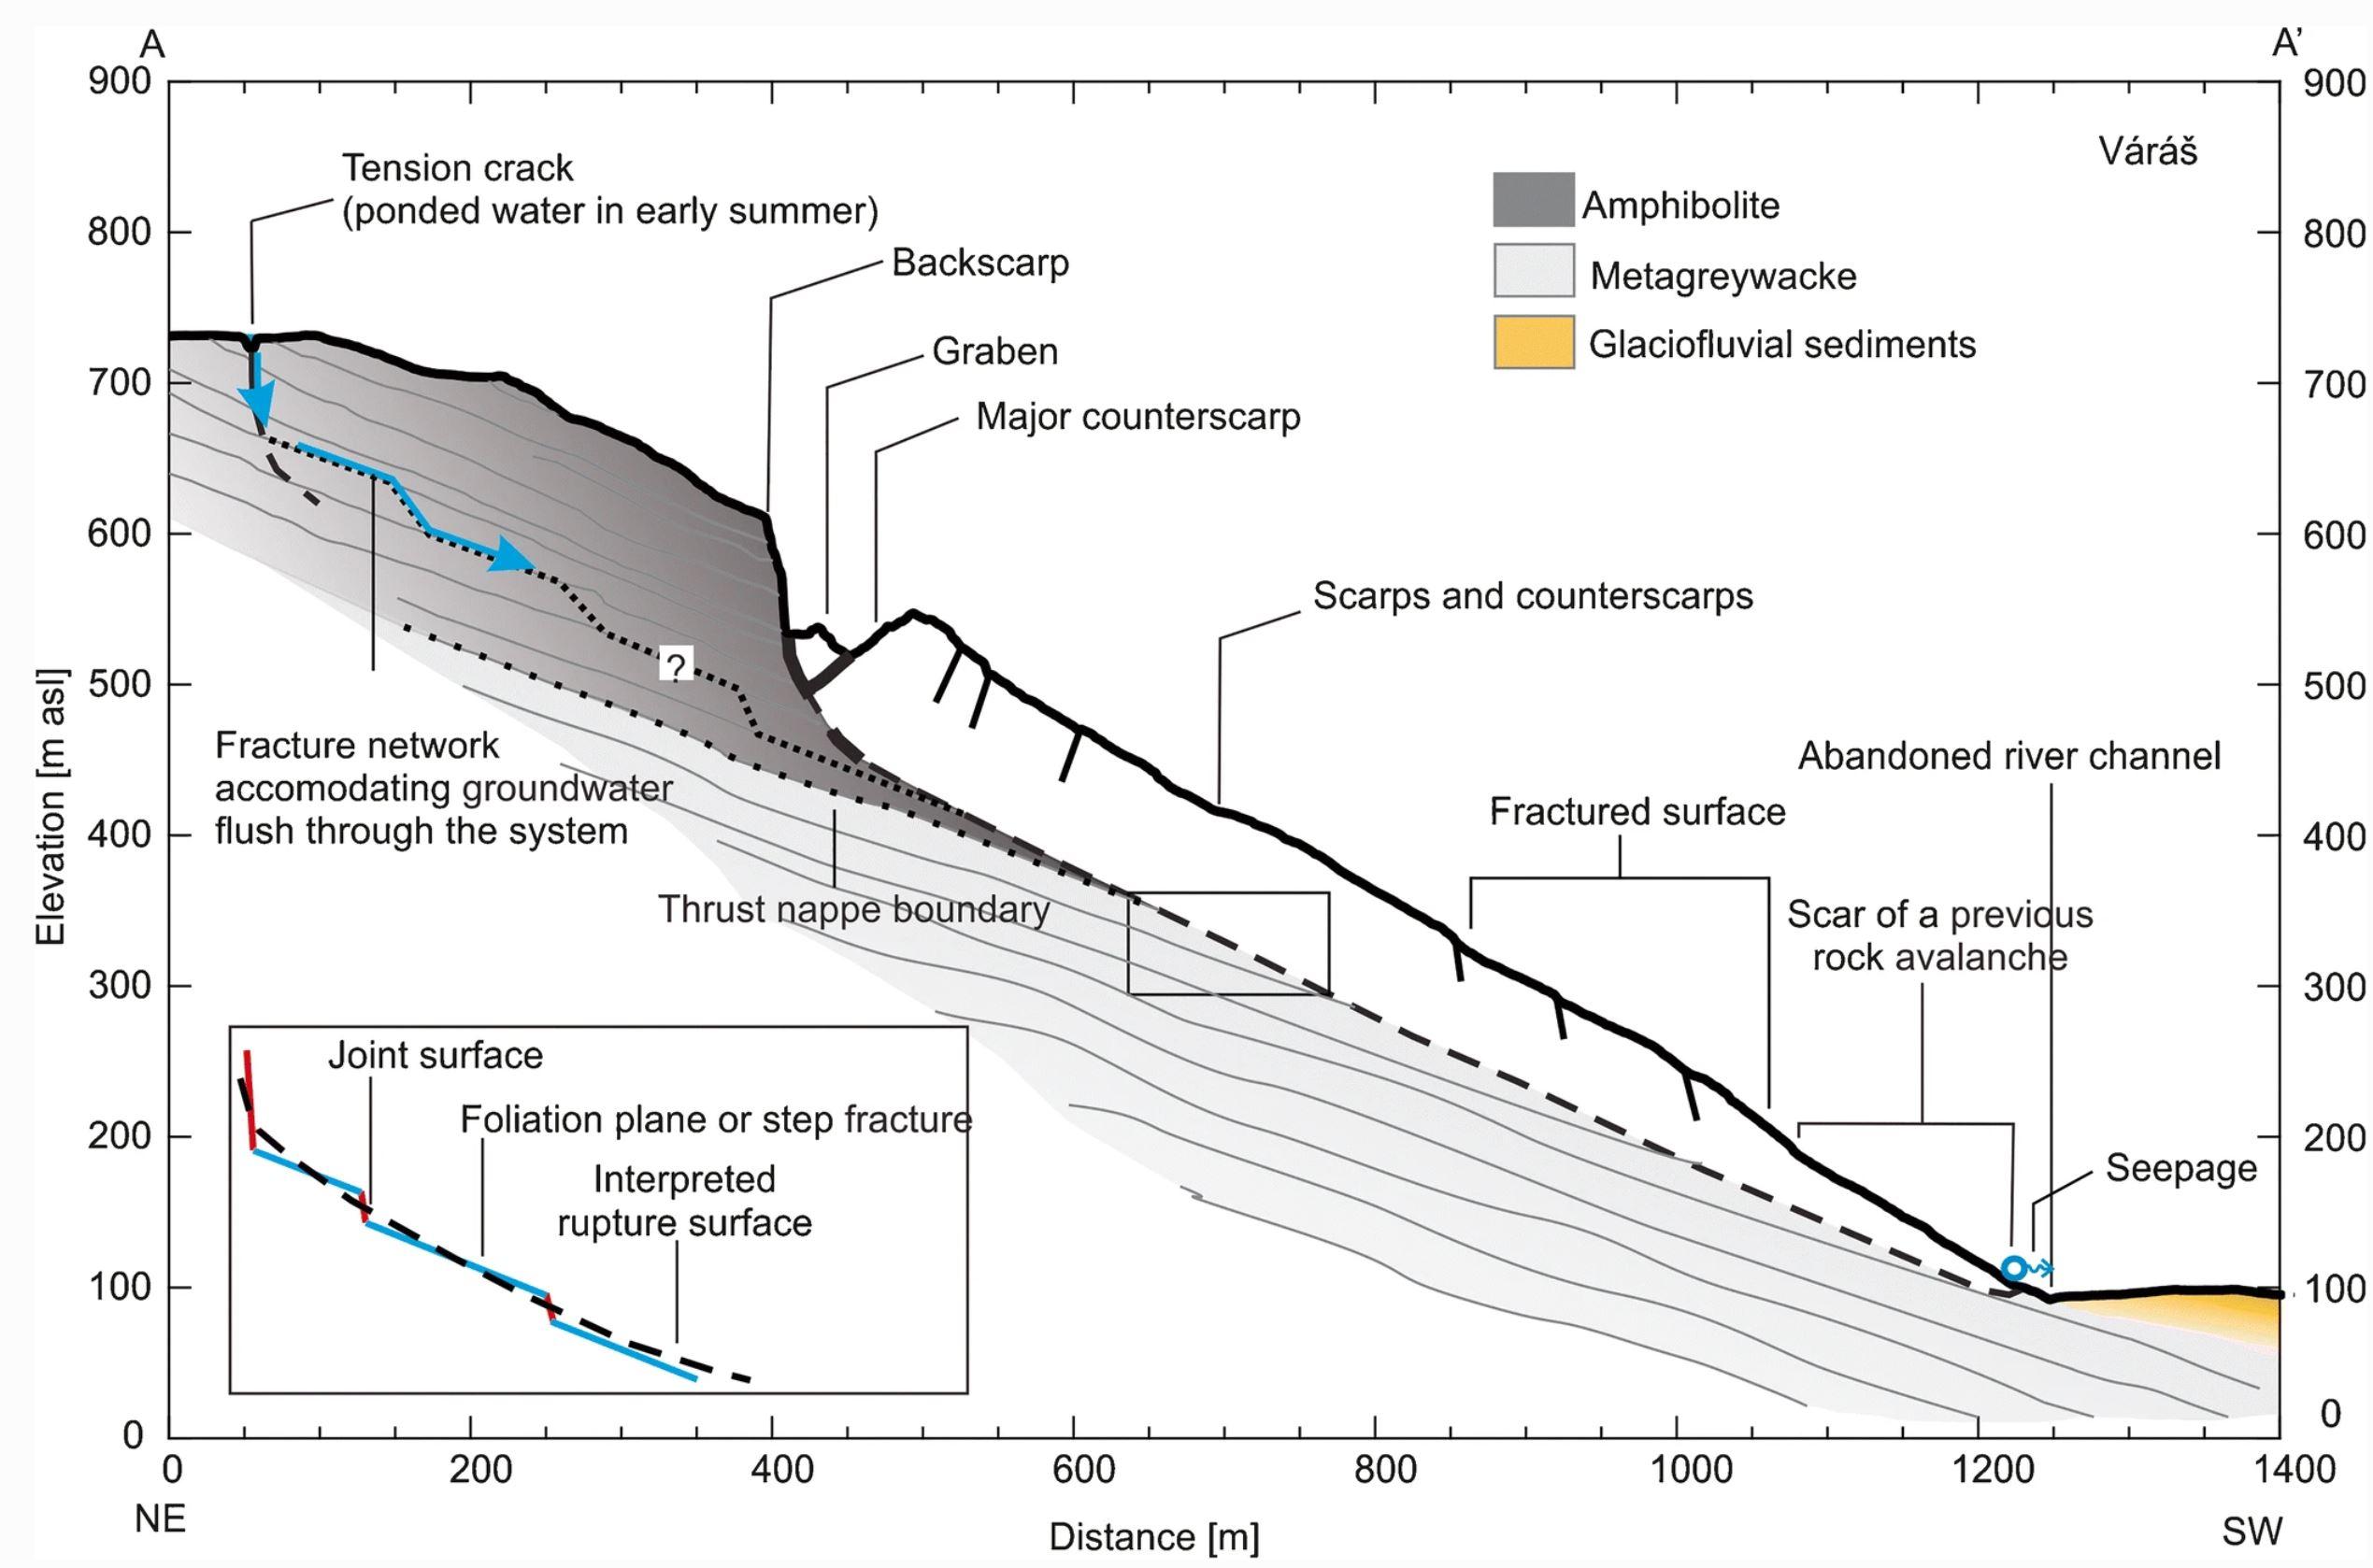 The Váráš rock slope deformation in Troms County, northern Norway,